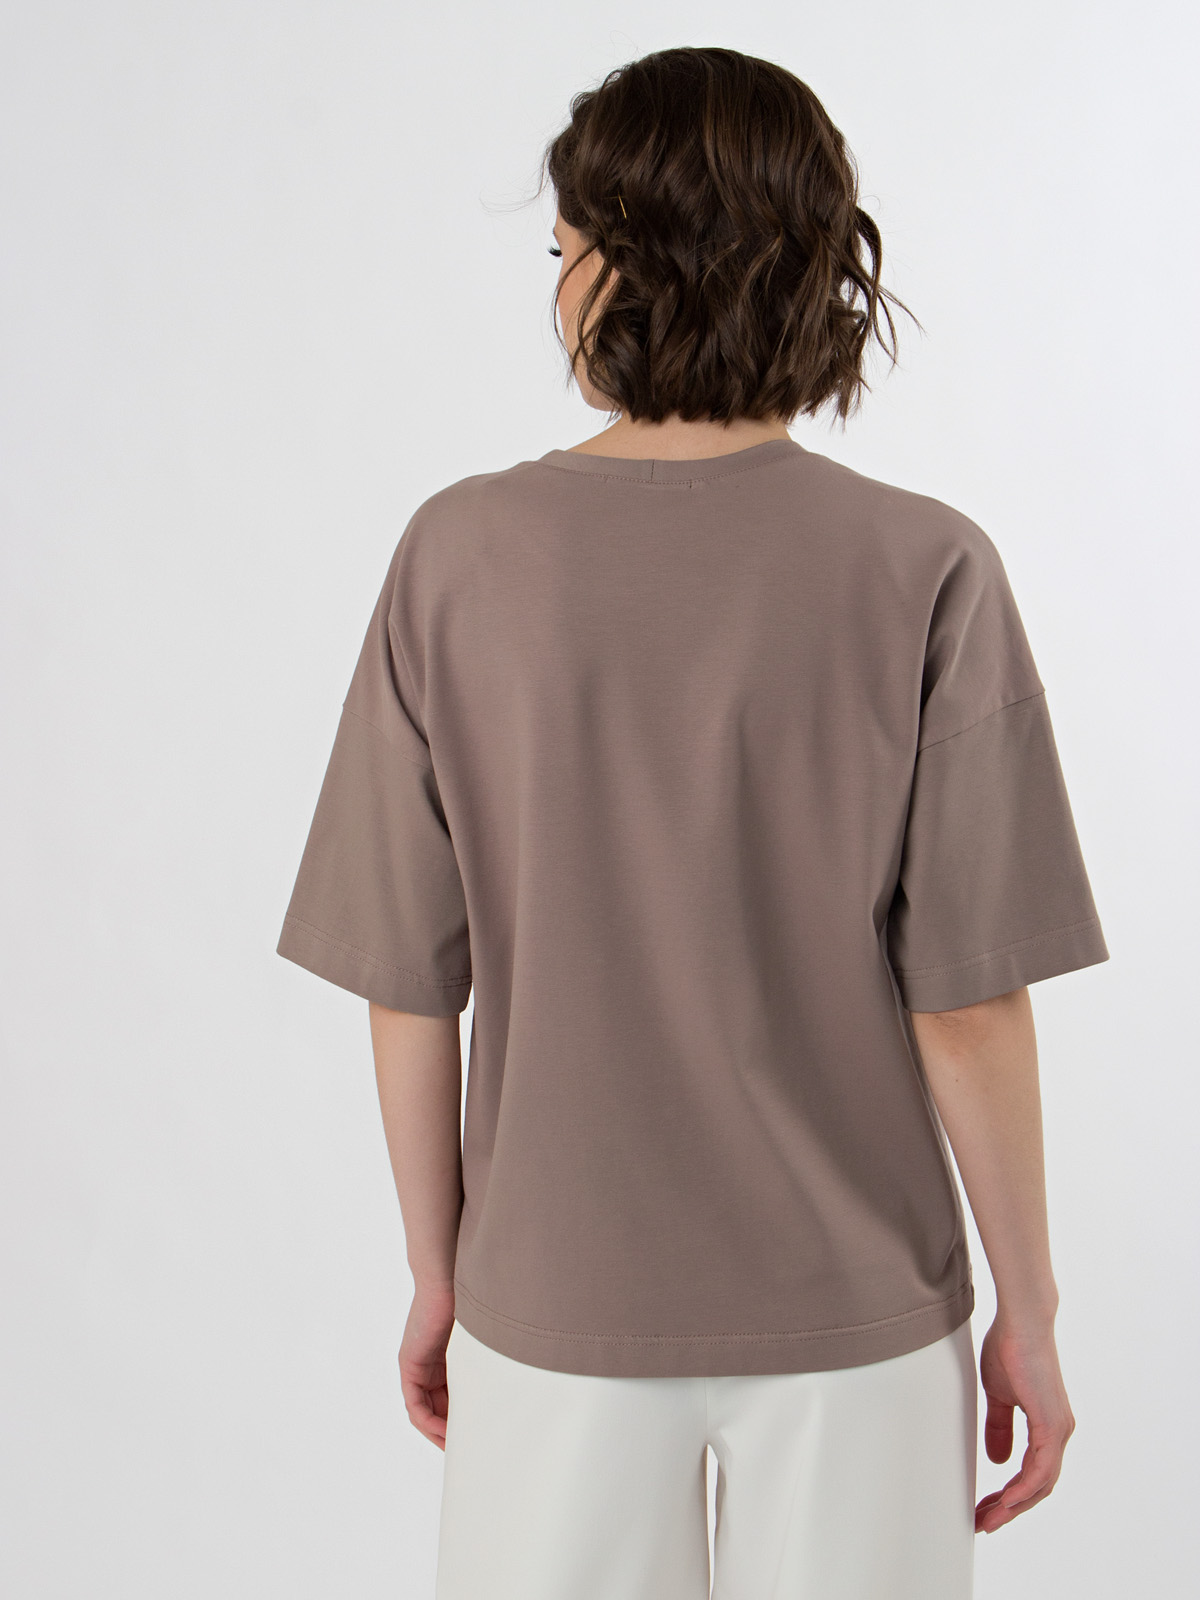 футболка 1728